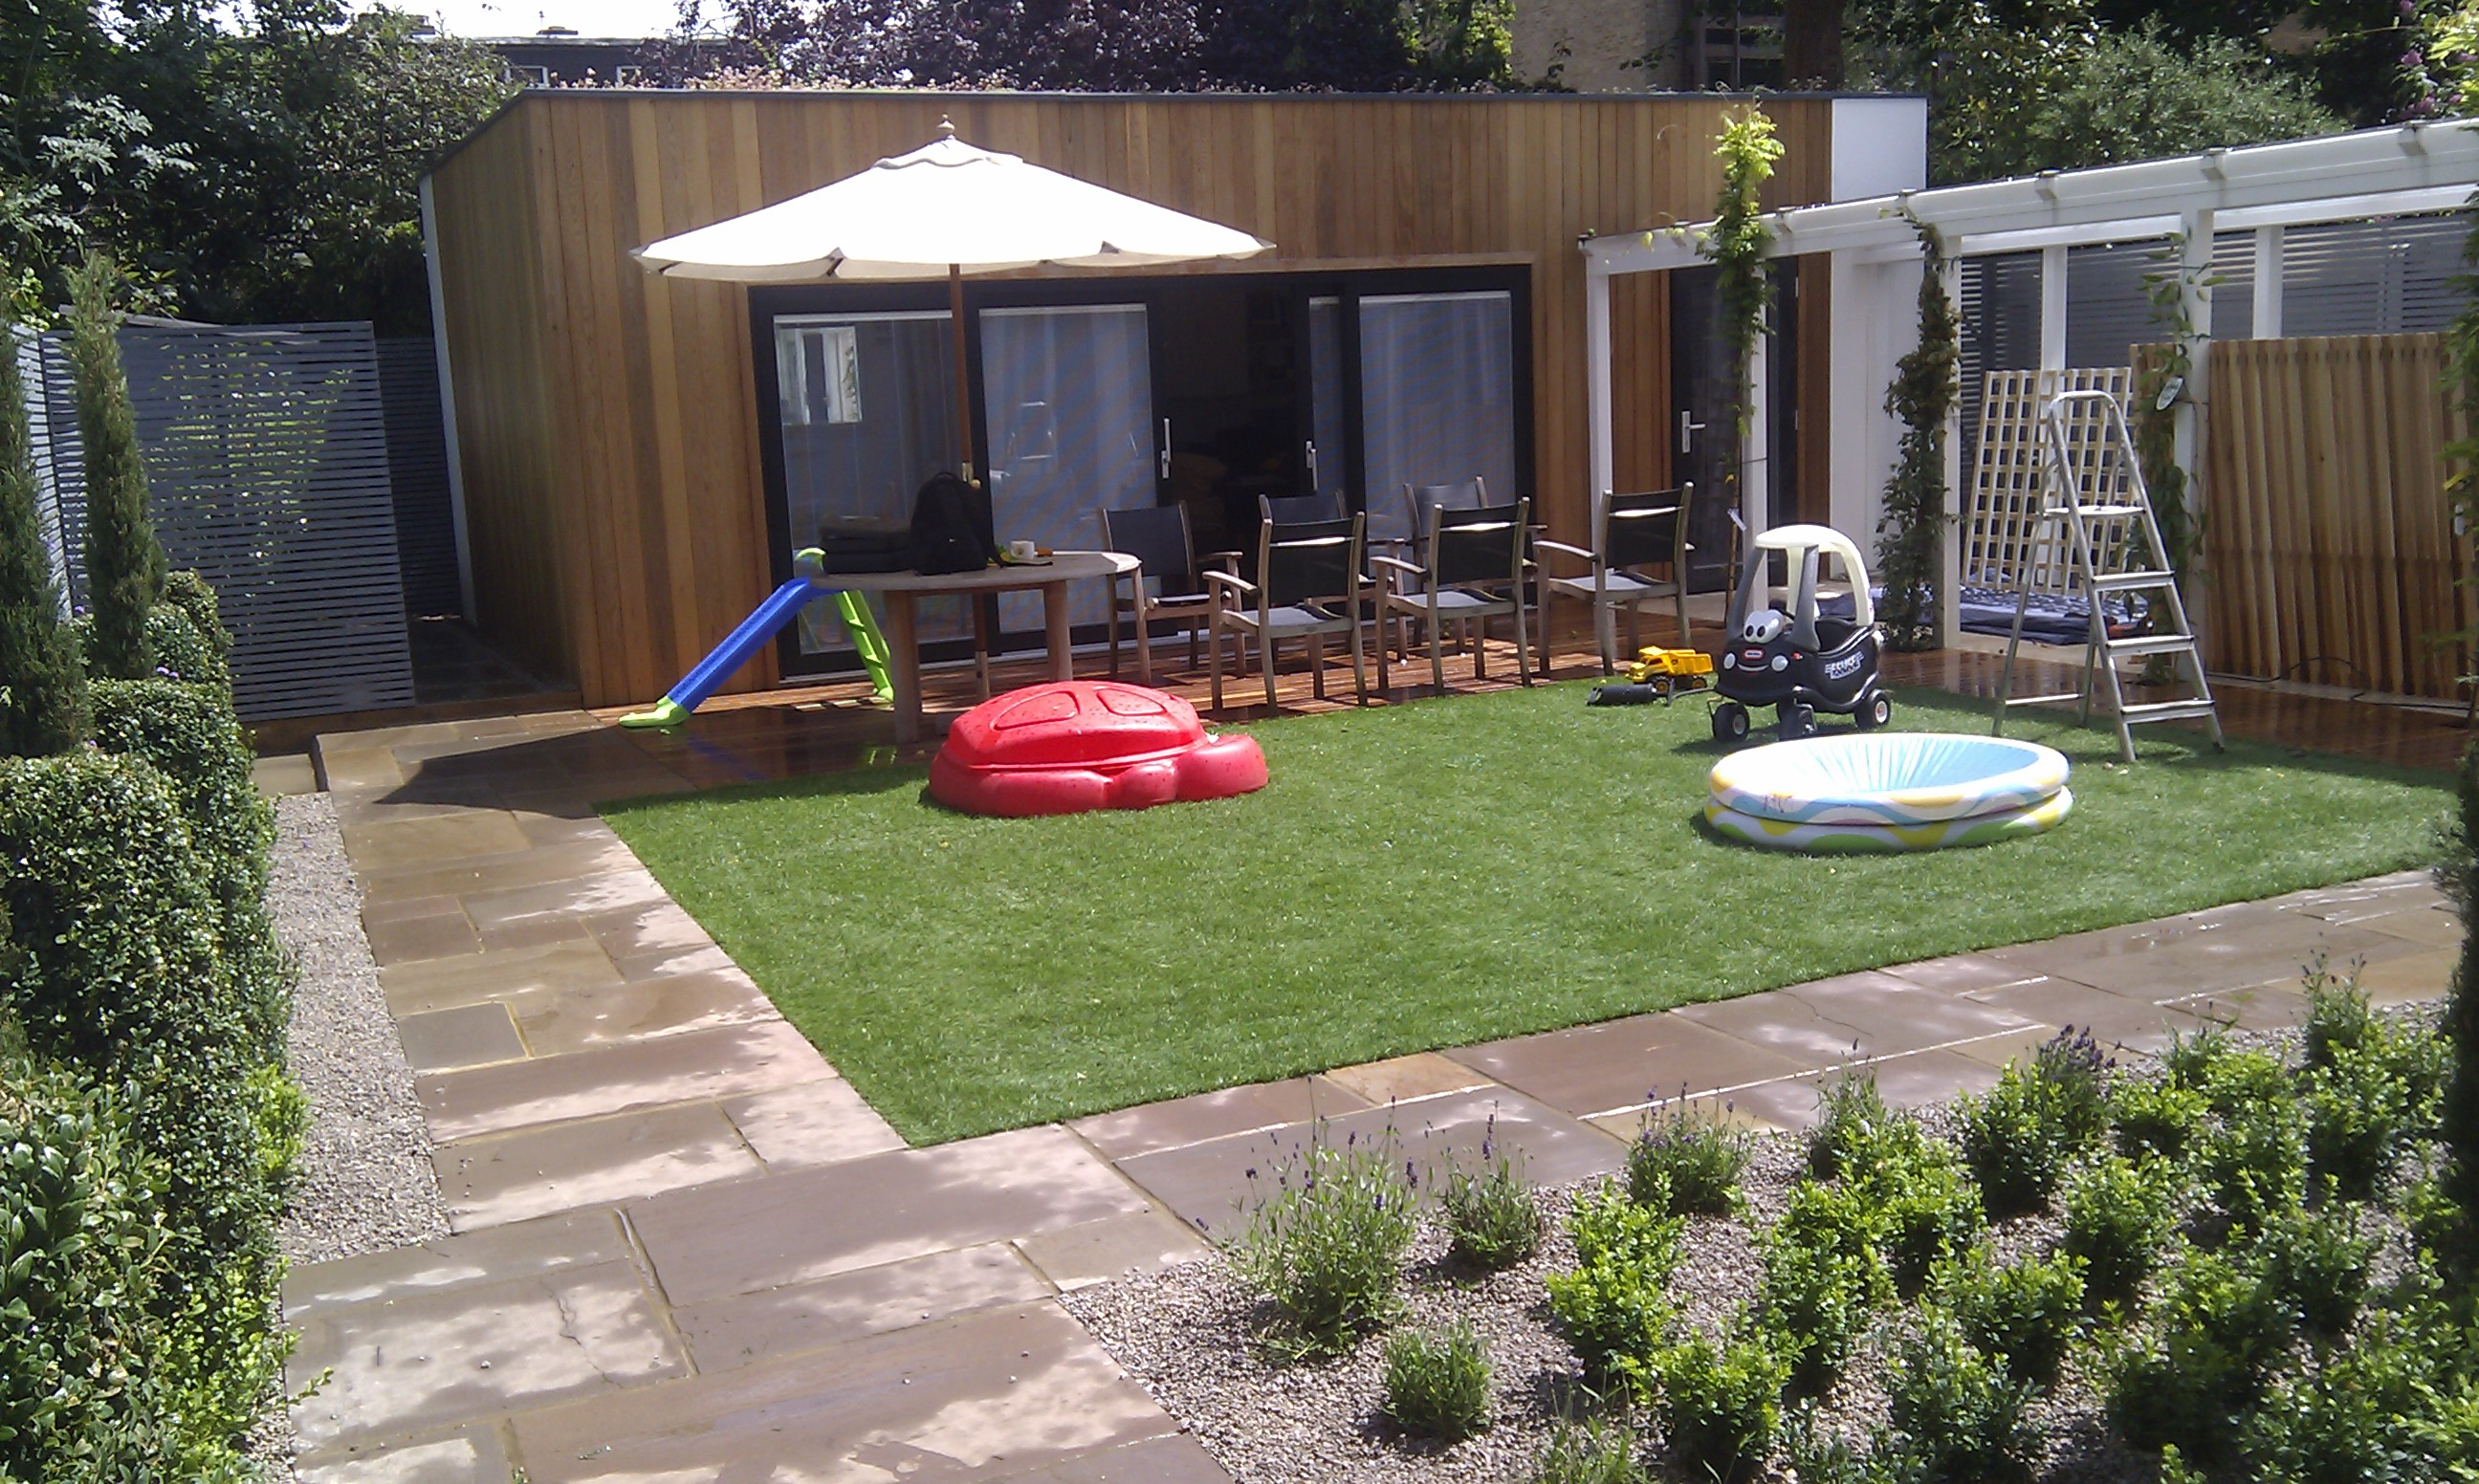 modern garden design london slatted grey privacy screen sandstone paving easy grass balau hardwood decking (7)